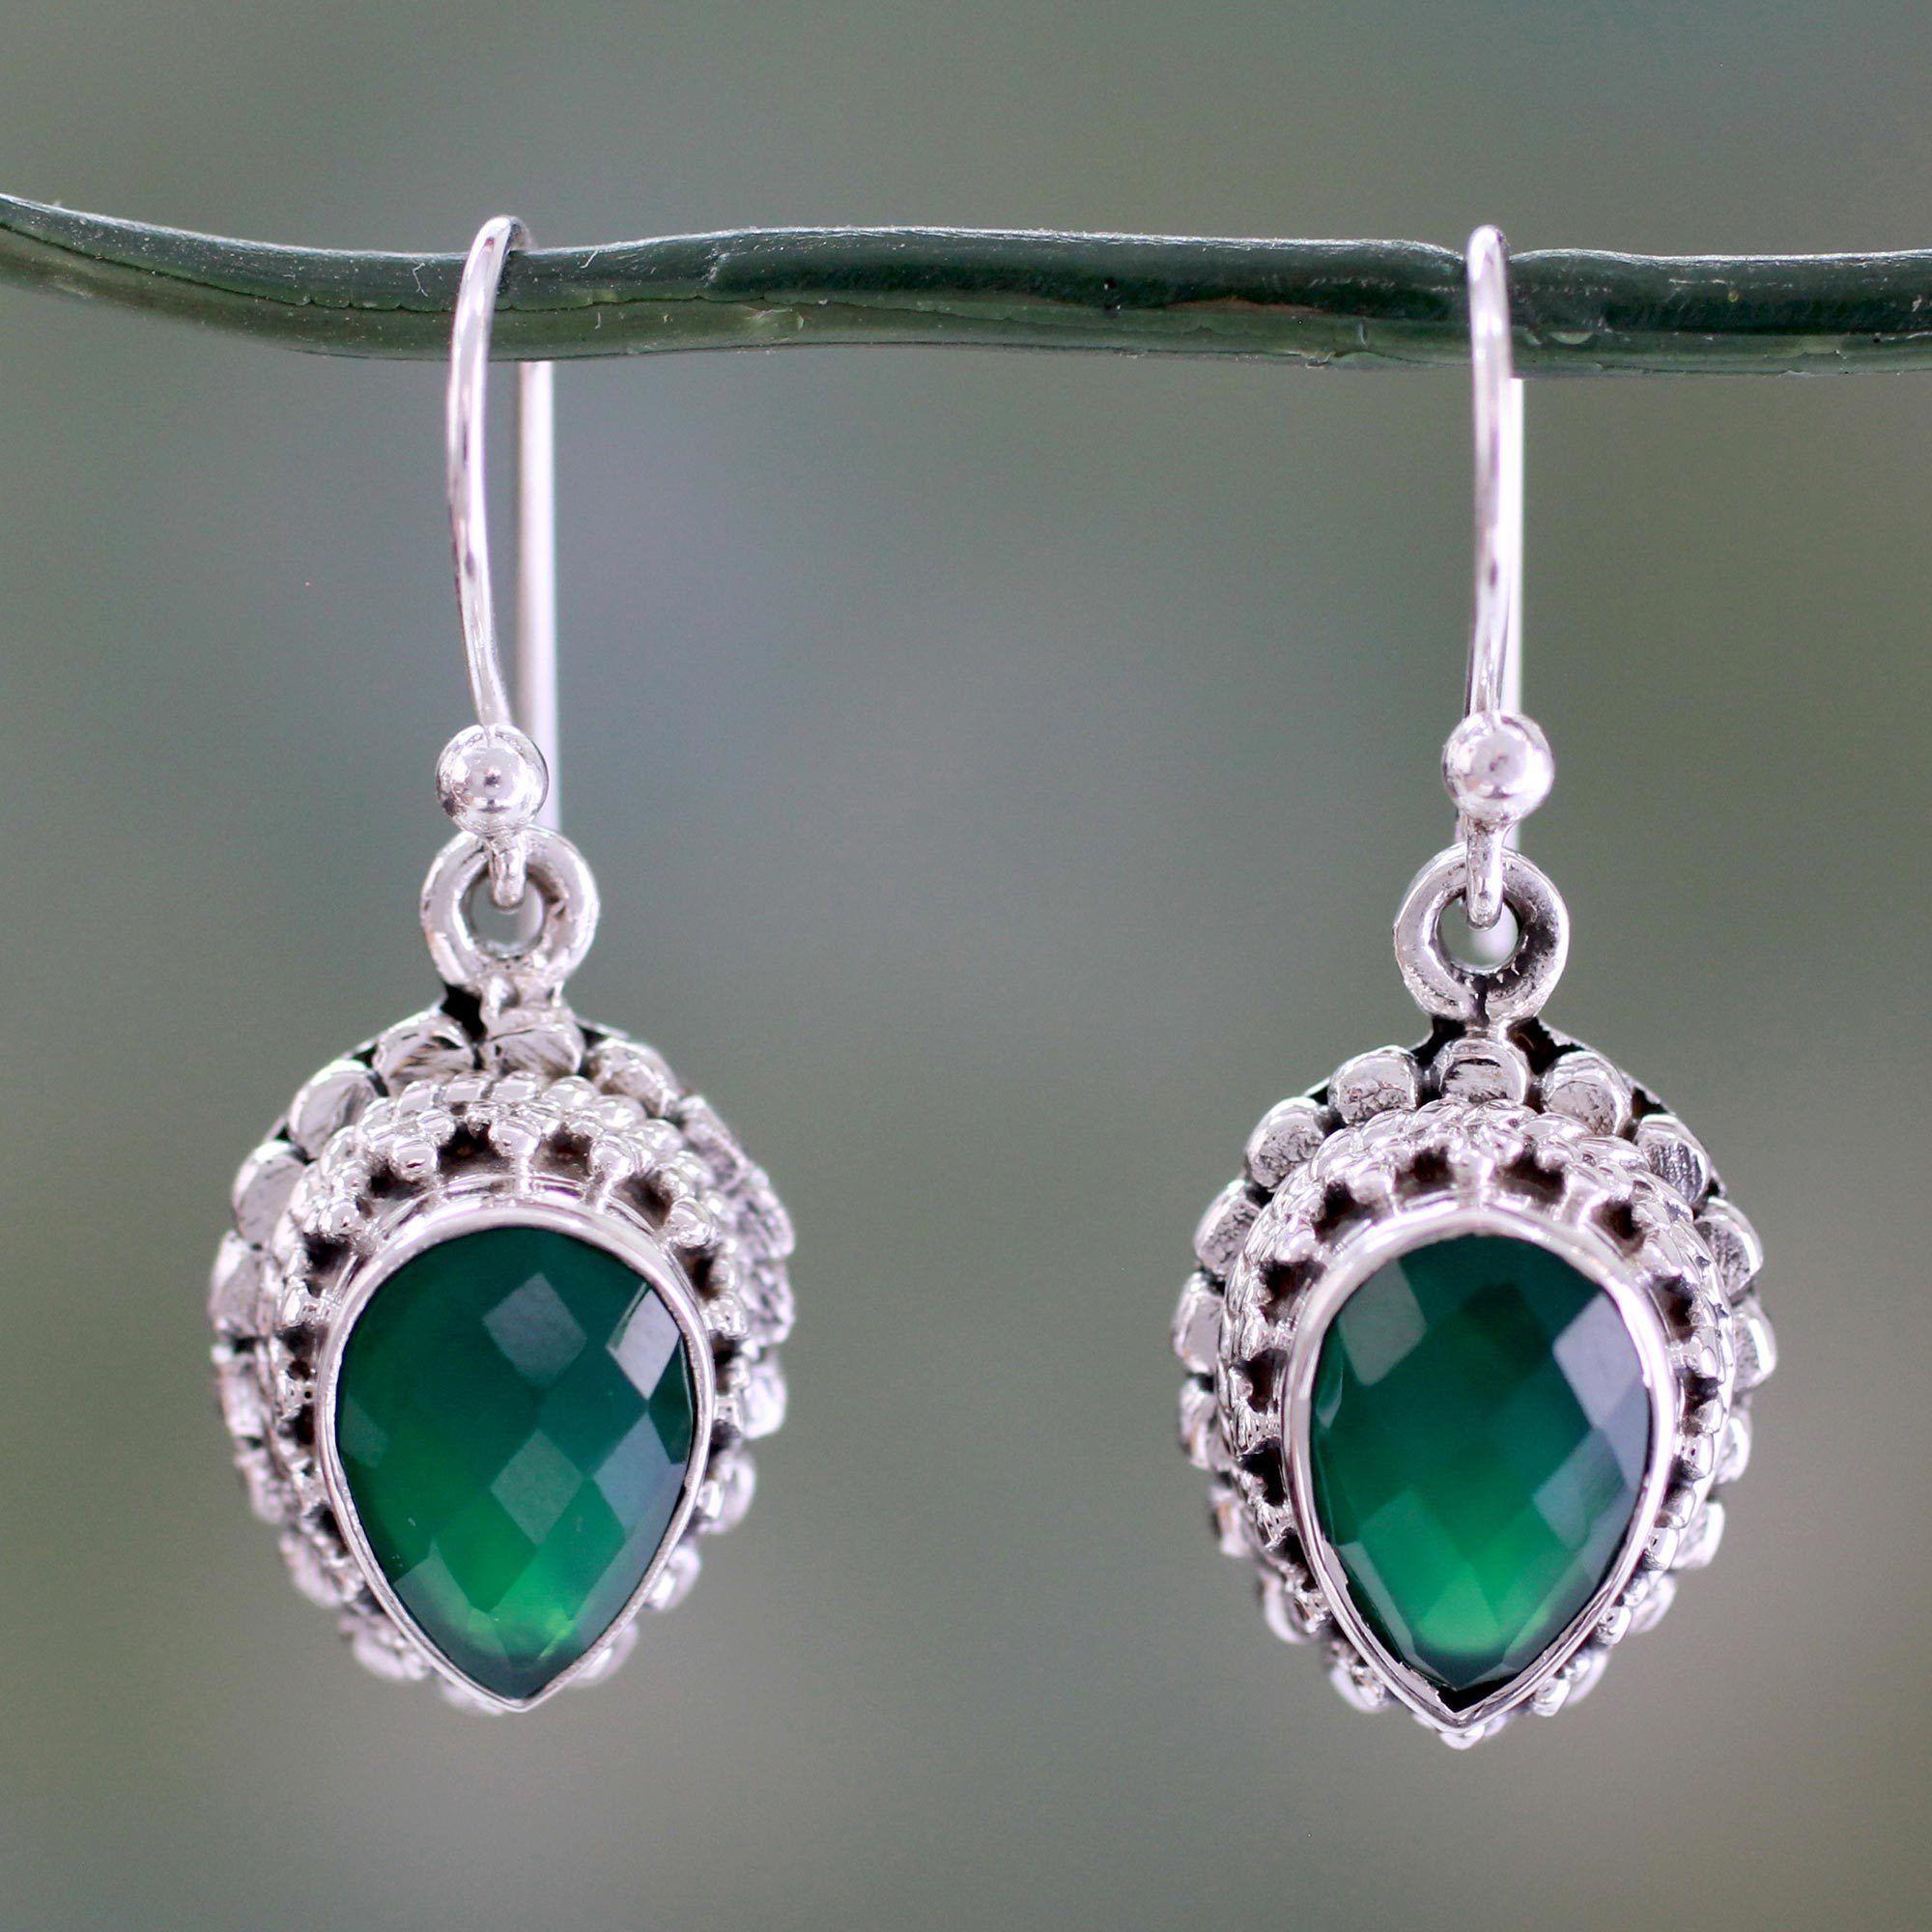 Novica Handcrafted Sterling 'Evergreen Dreams' Onyx Earrings